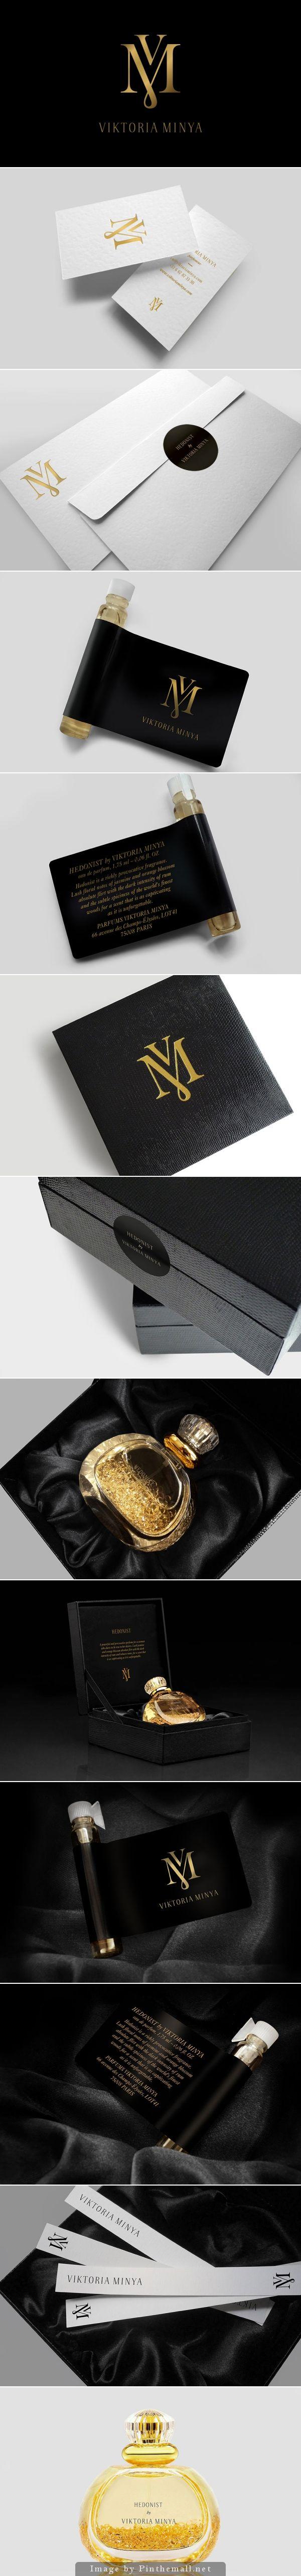 Hungary's first perfume created by Viktoria Minya has stellar Kiss Miklos #packaging curated by Packaging Diva PD created via http://kissmiklos.com/viktoria-minya-2?ref=netgeek06